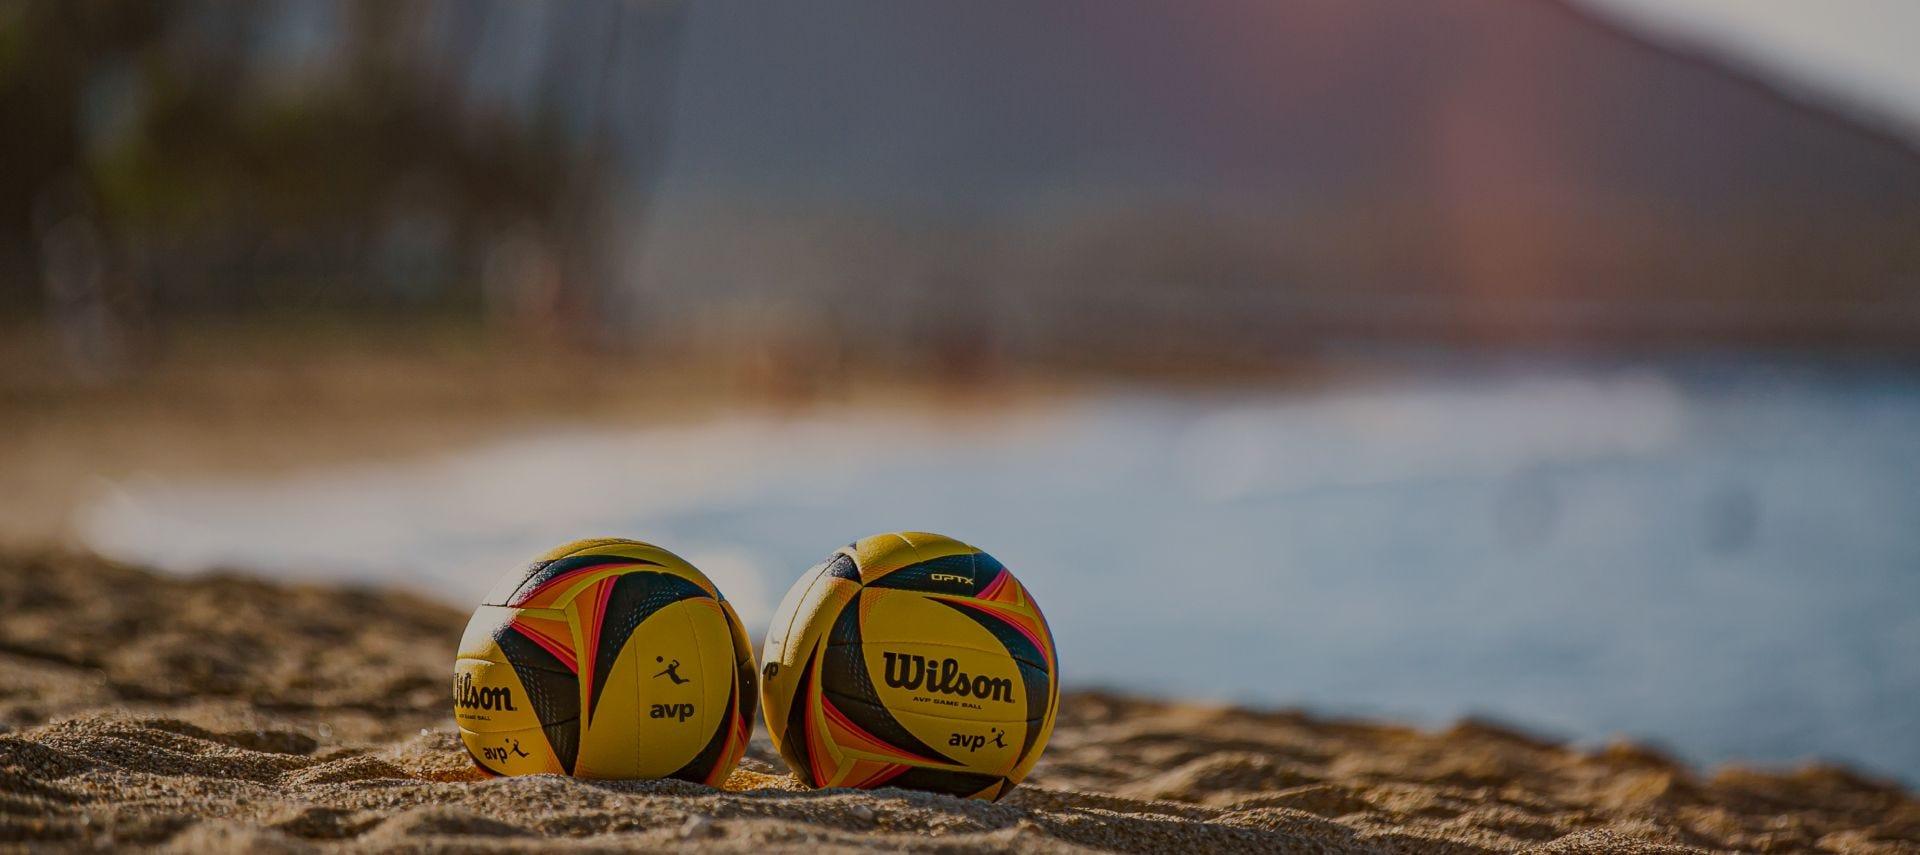 AVP OPTX Volleyball on the beach